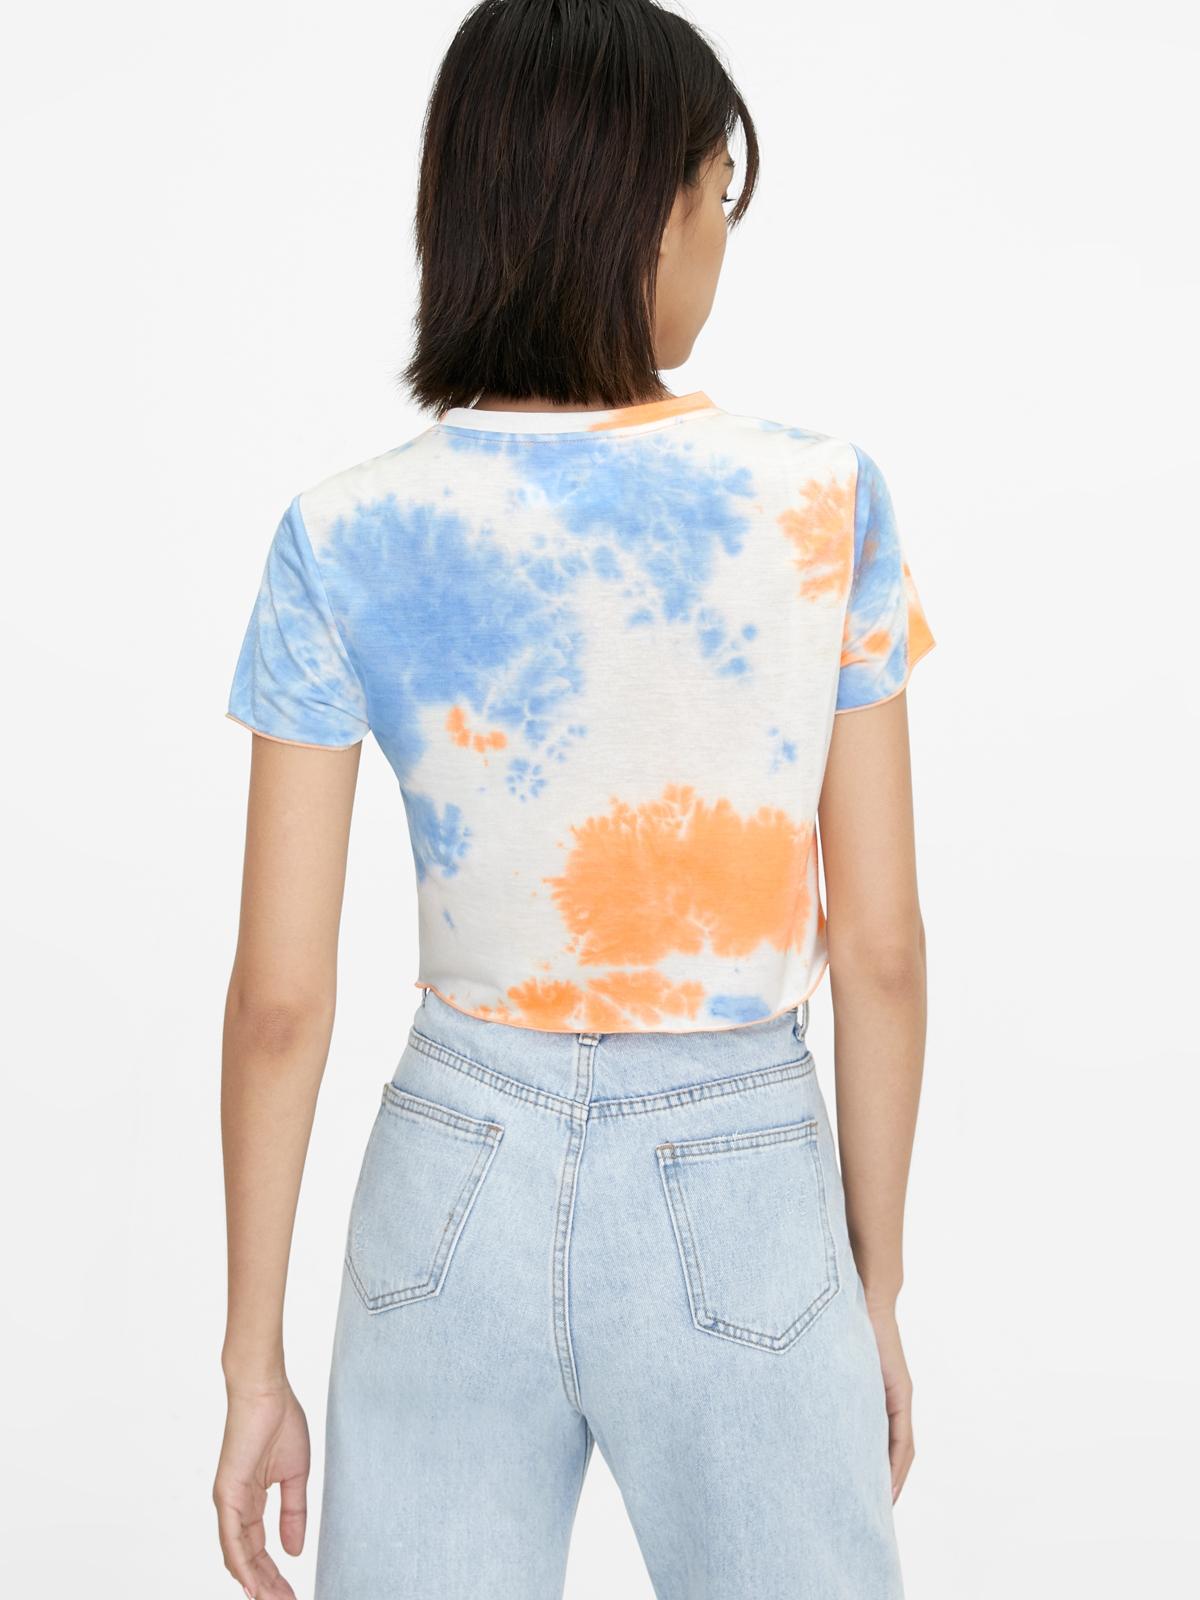 Pastel Tie Dye Crop Top Orange